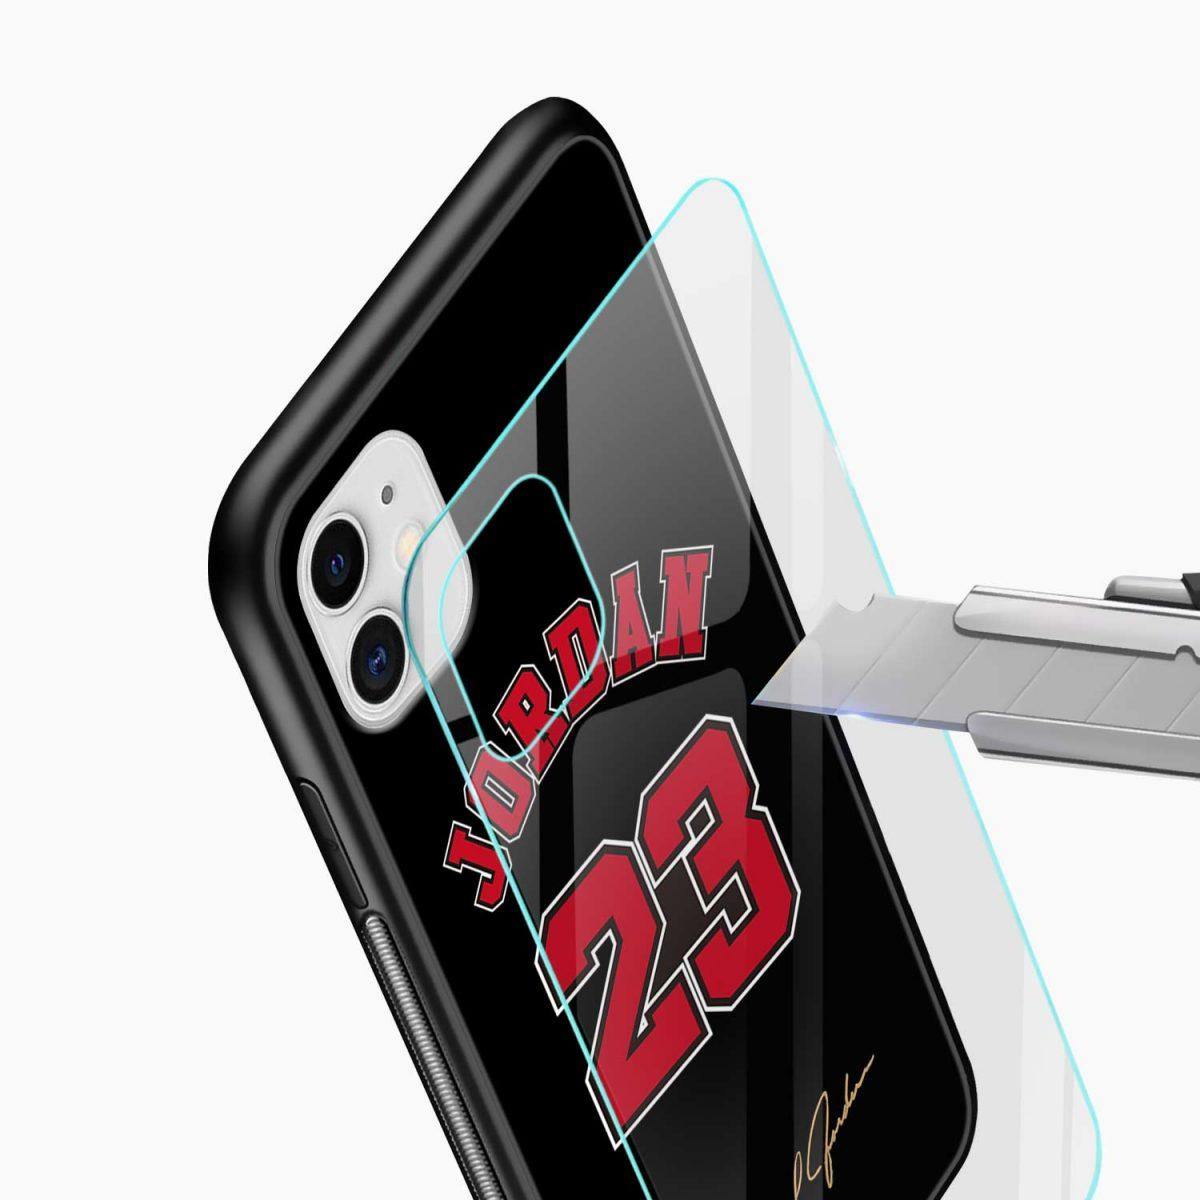 jordan 23 iphone back cover glass view